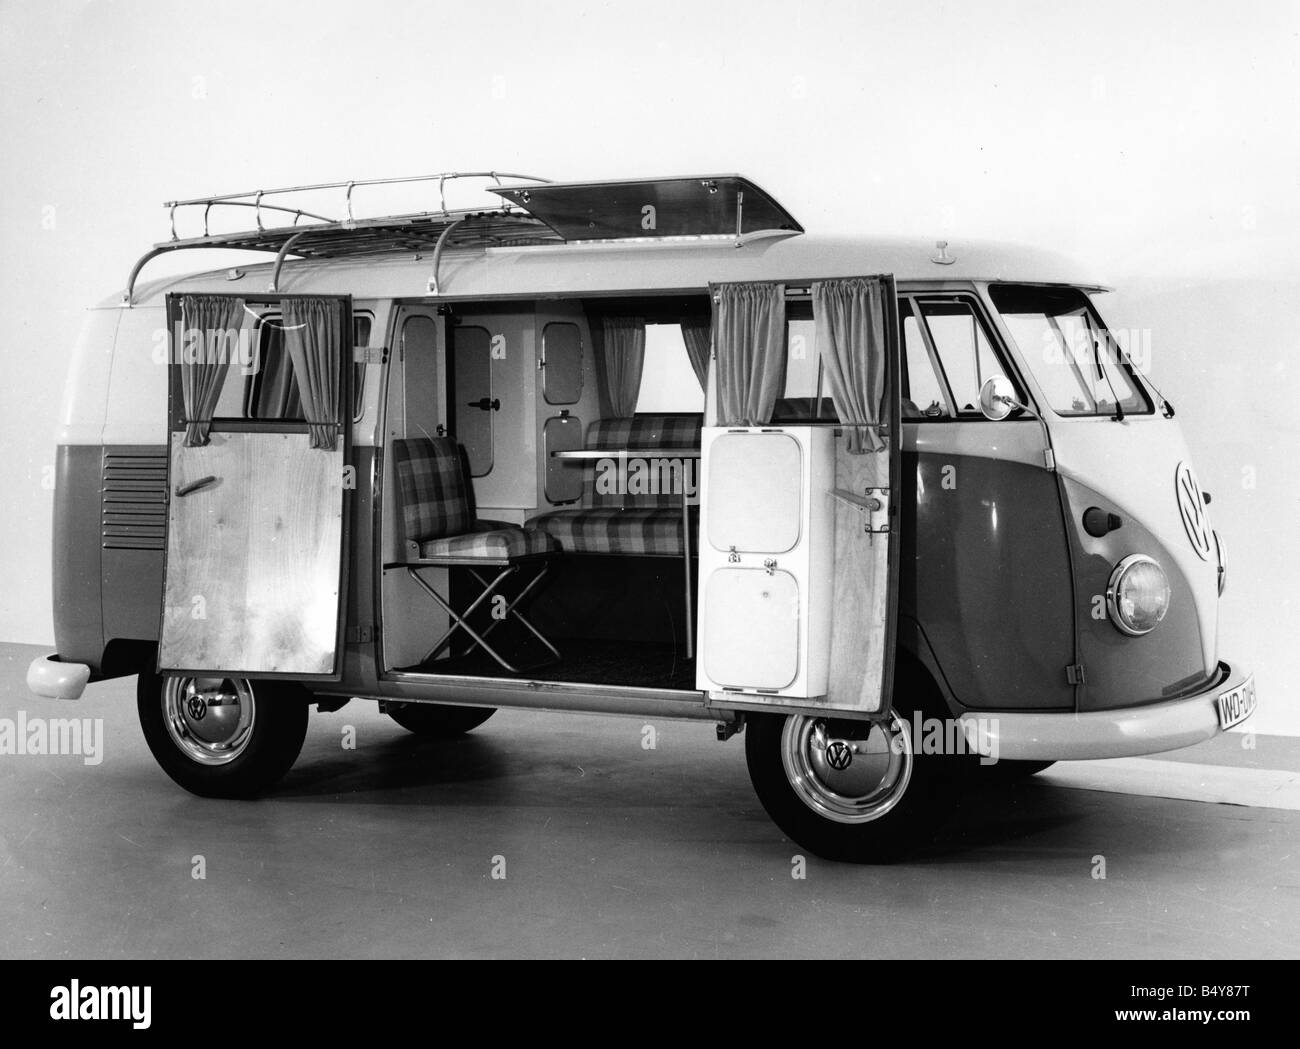 transport / transportation, car, vehicle variants, Volkswagen, VW Type 2, Transporter T1, extended variant, 1970s, - Stock Image